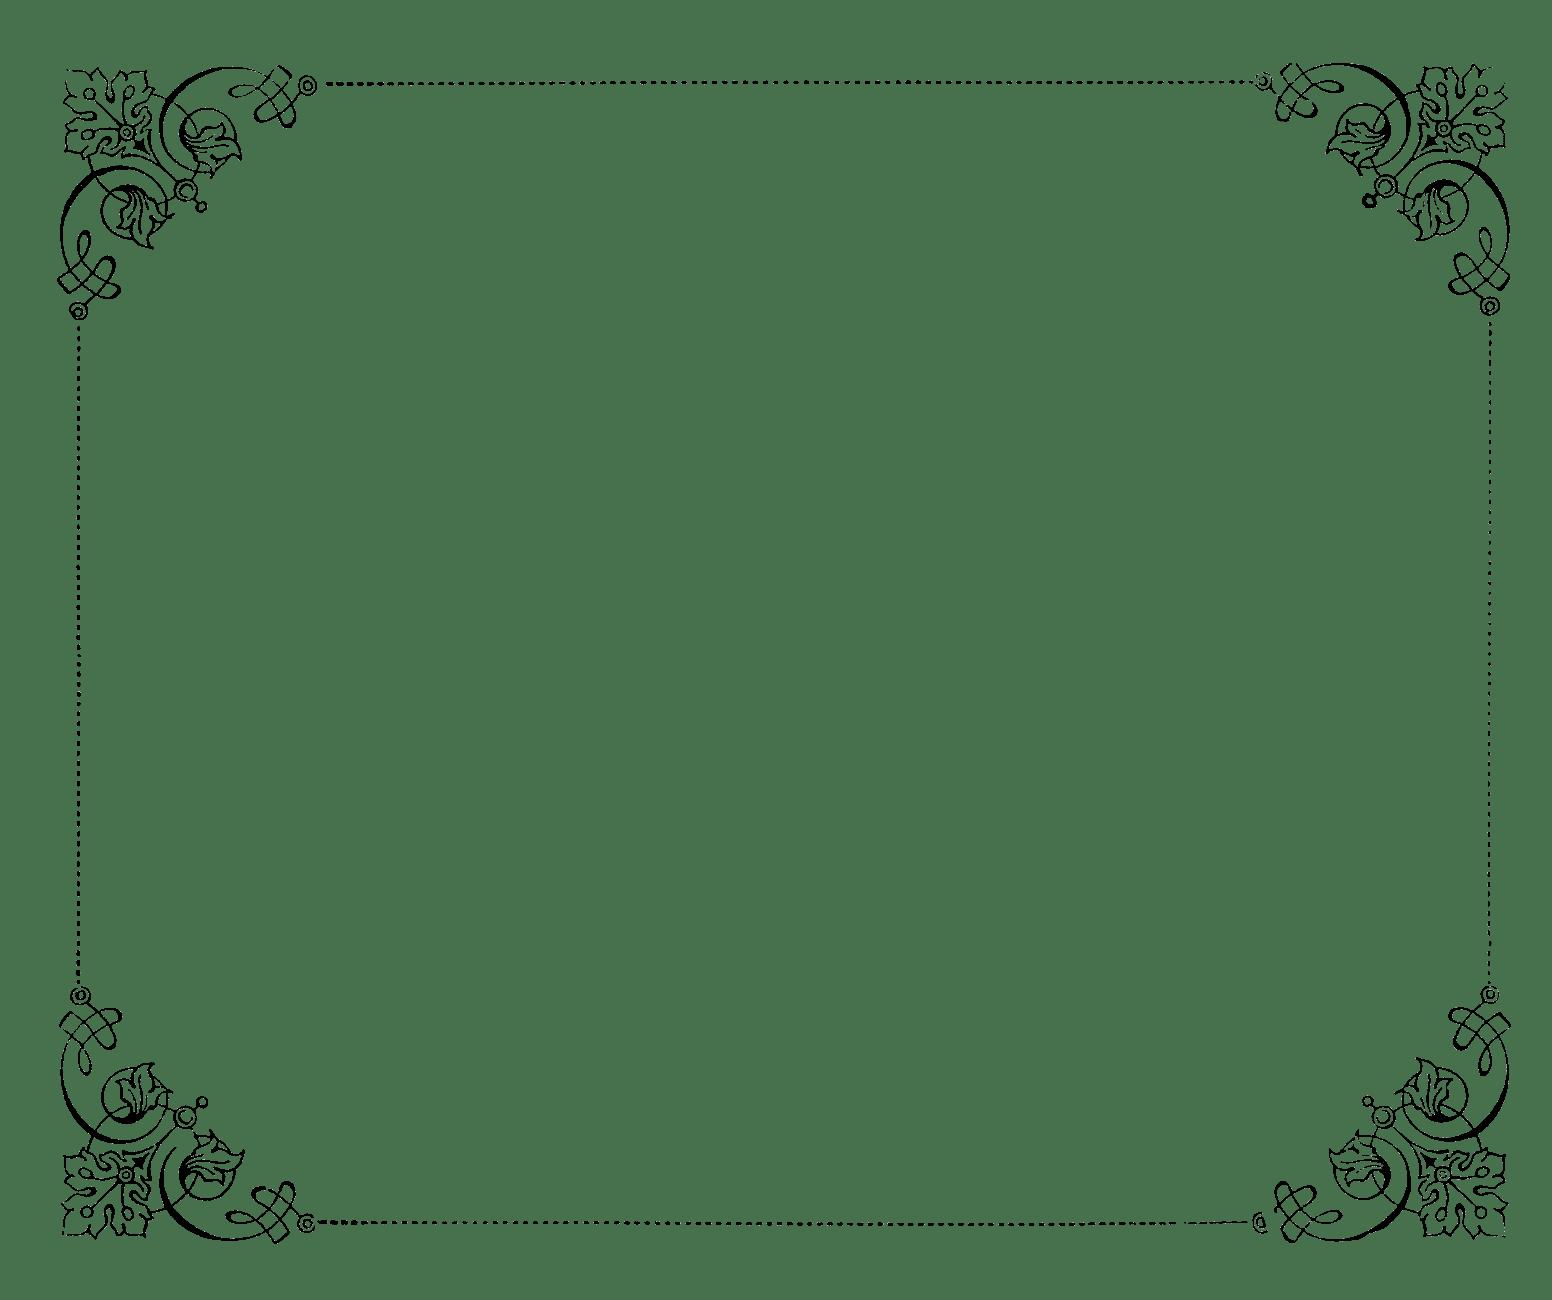 Elegant Page Borders Clip Art